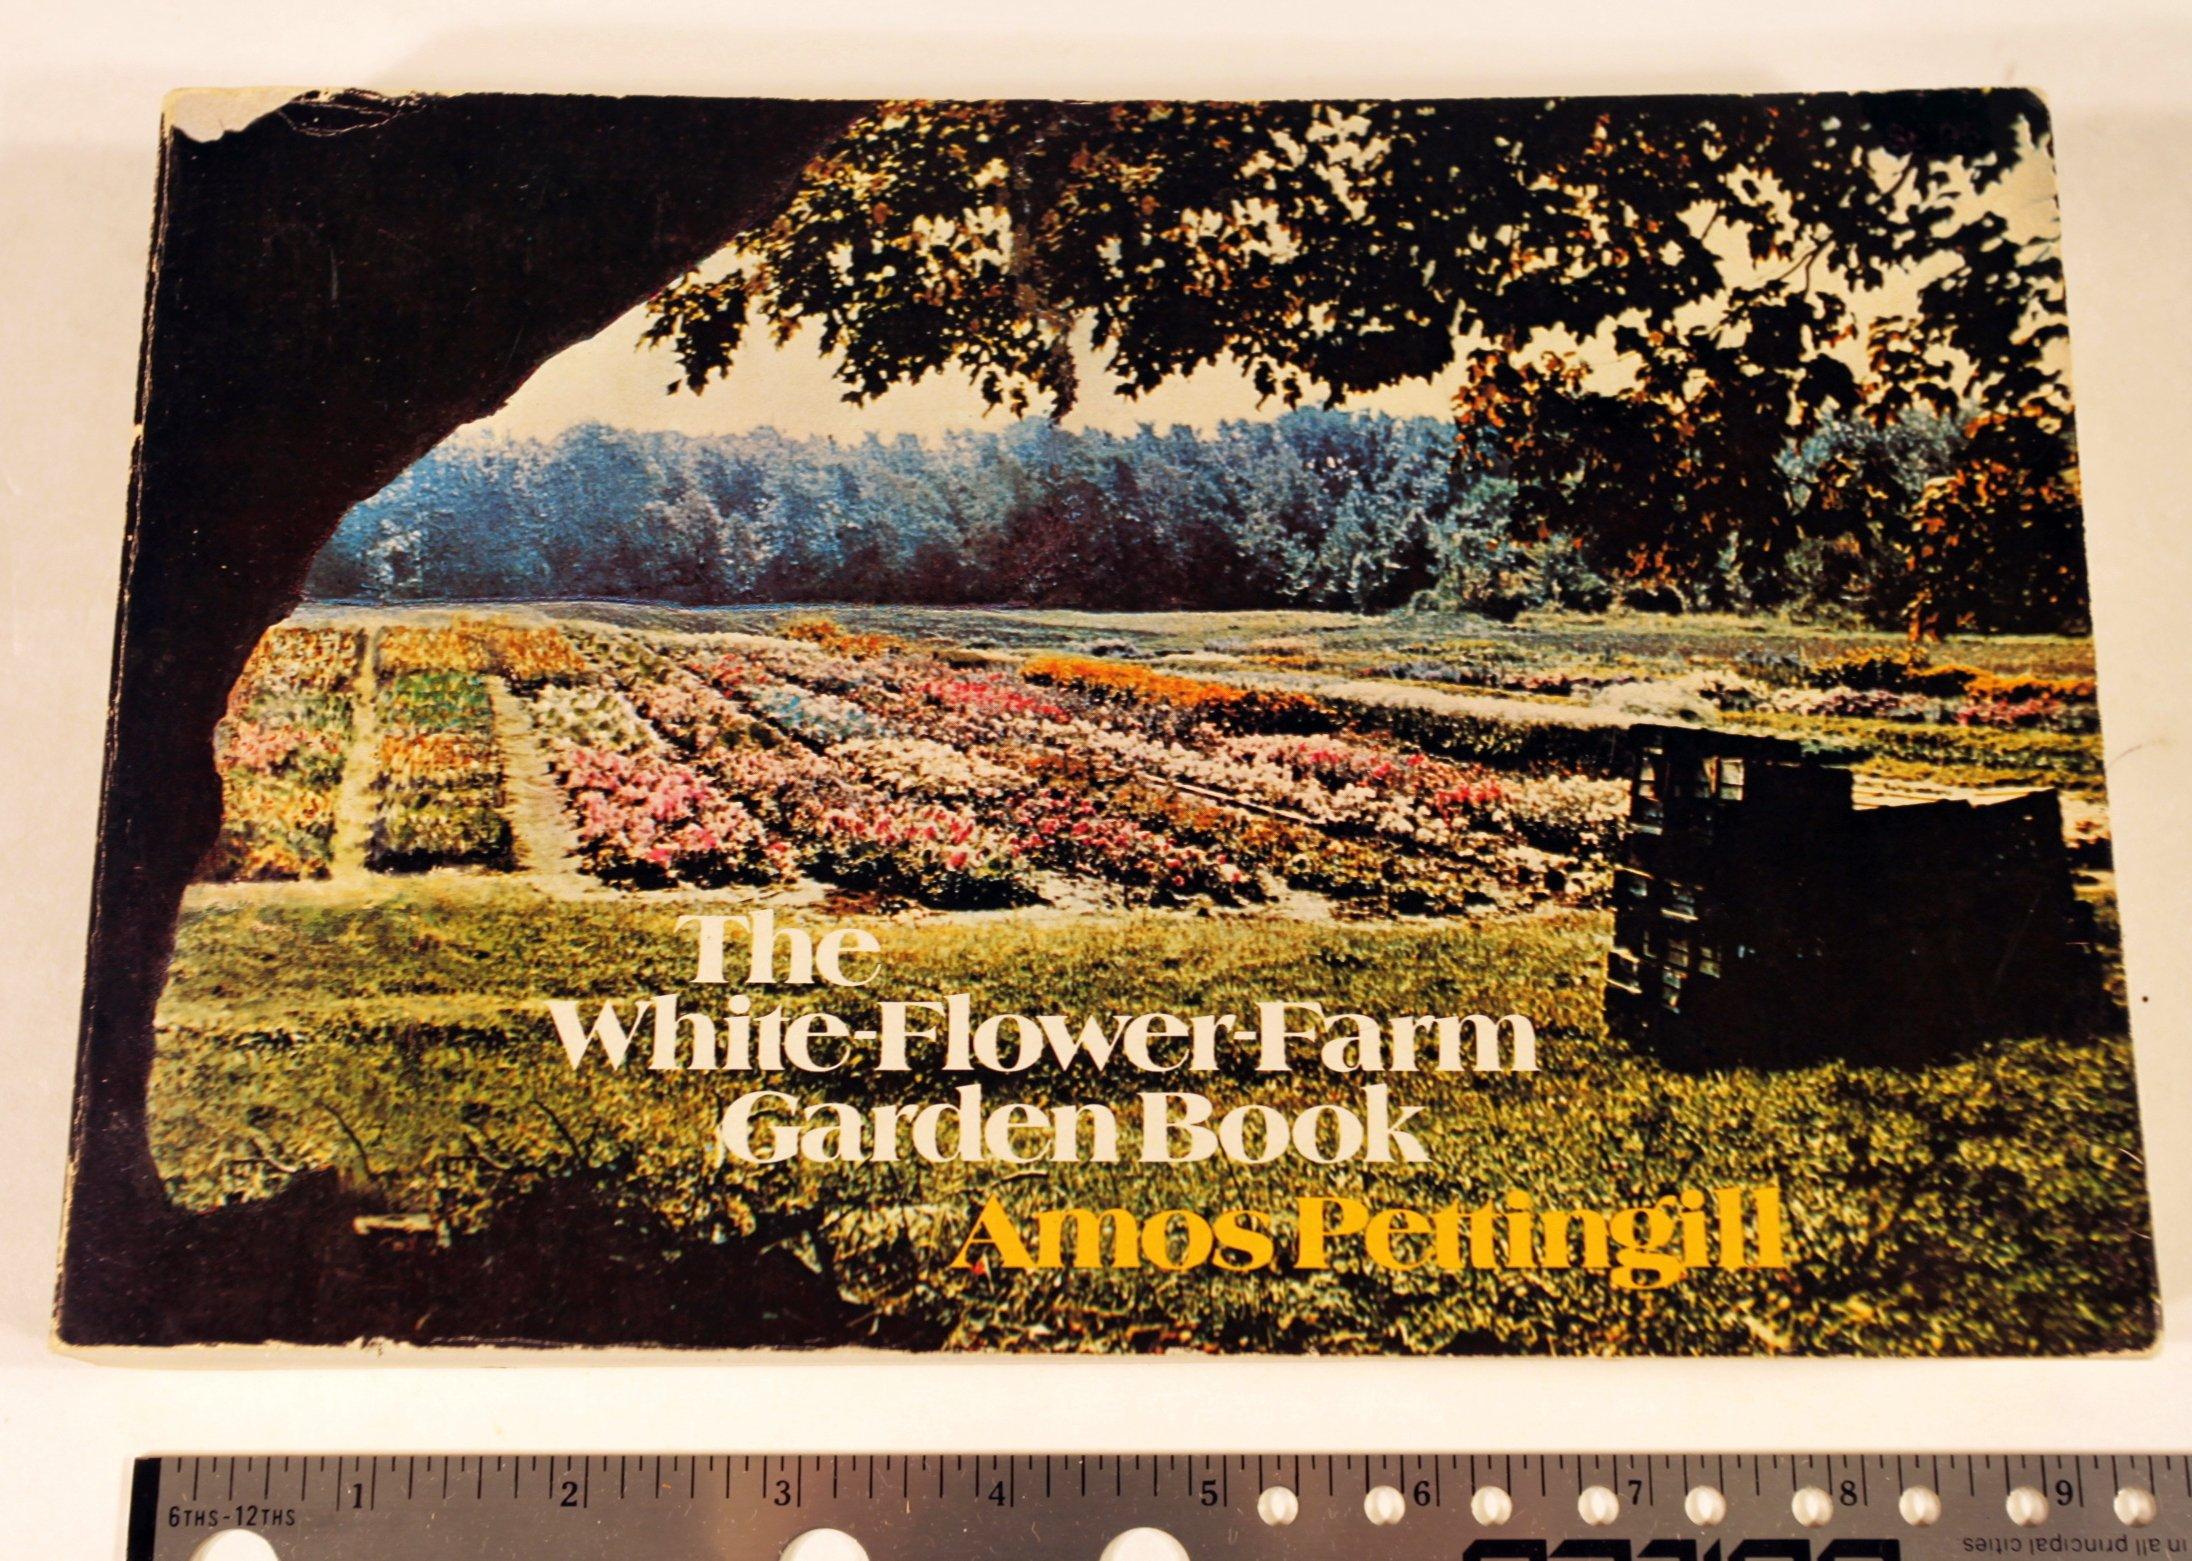 The White Flower Farm Garden Book Amos Pettingill 9780316704007